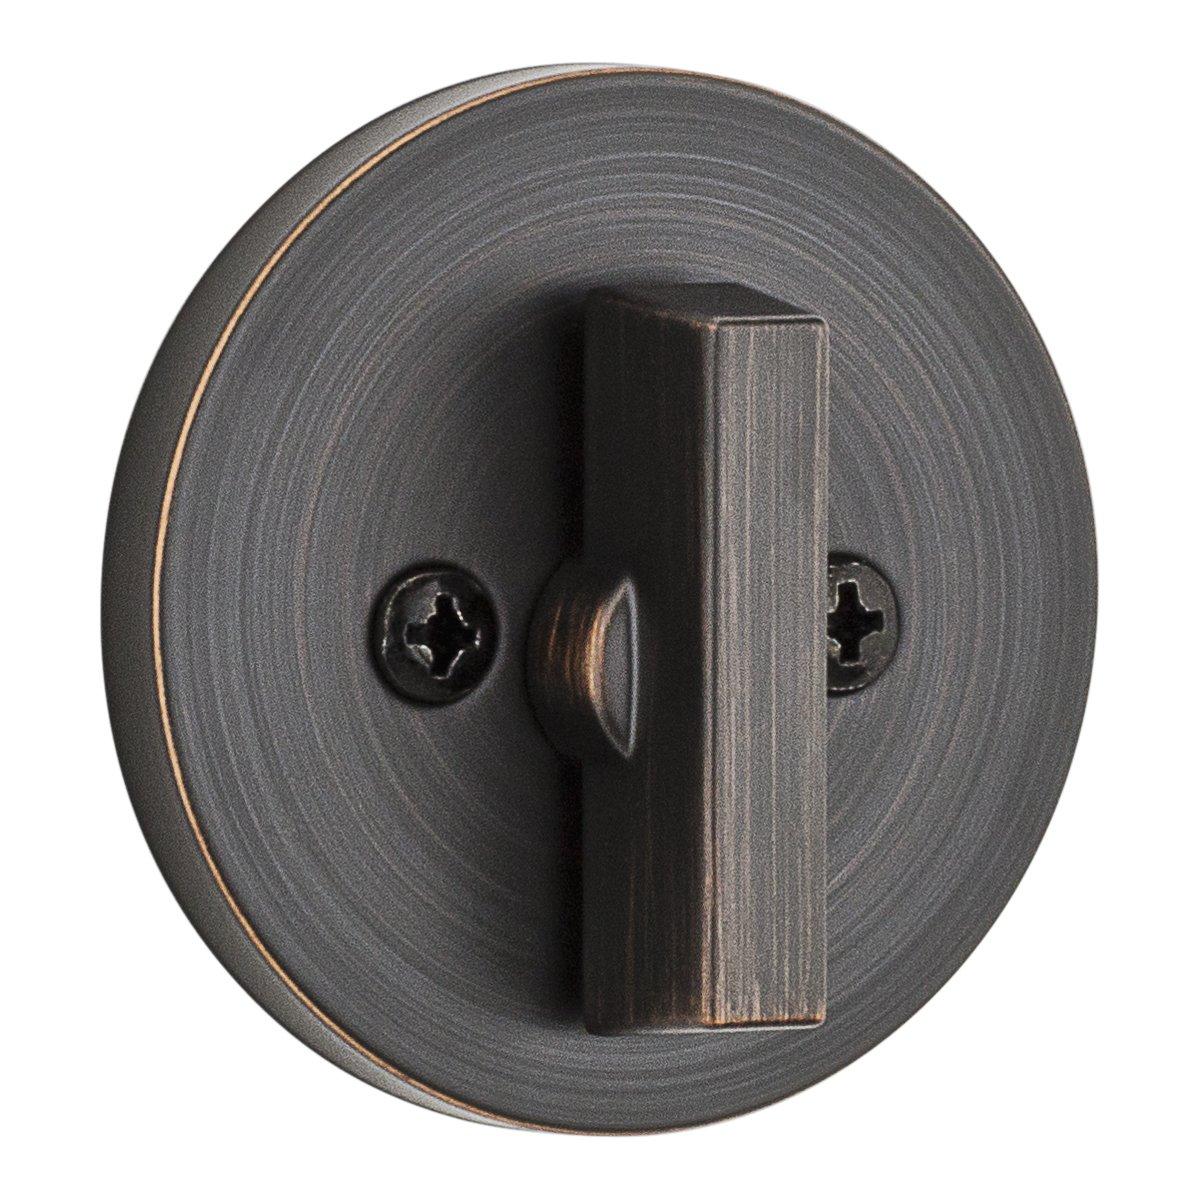 Kwikset 96600-679 Contemporary Single Cylinder Deadbolt Featuring Smartkey In Venetian Bronze